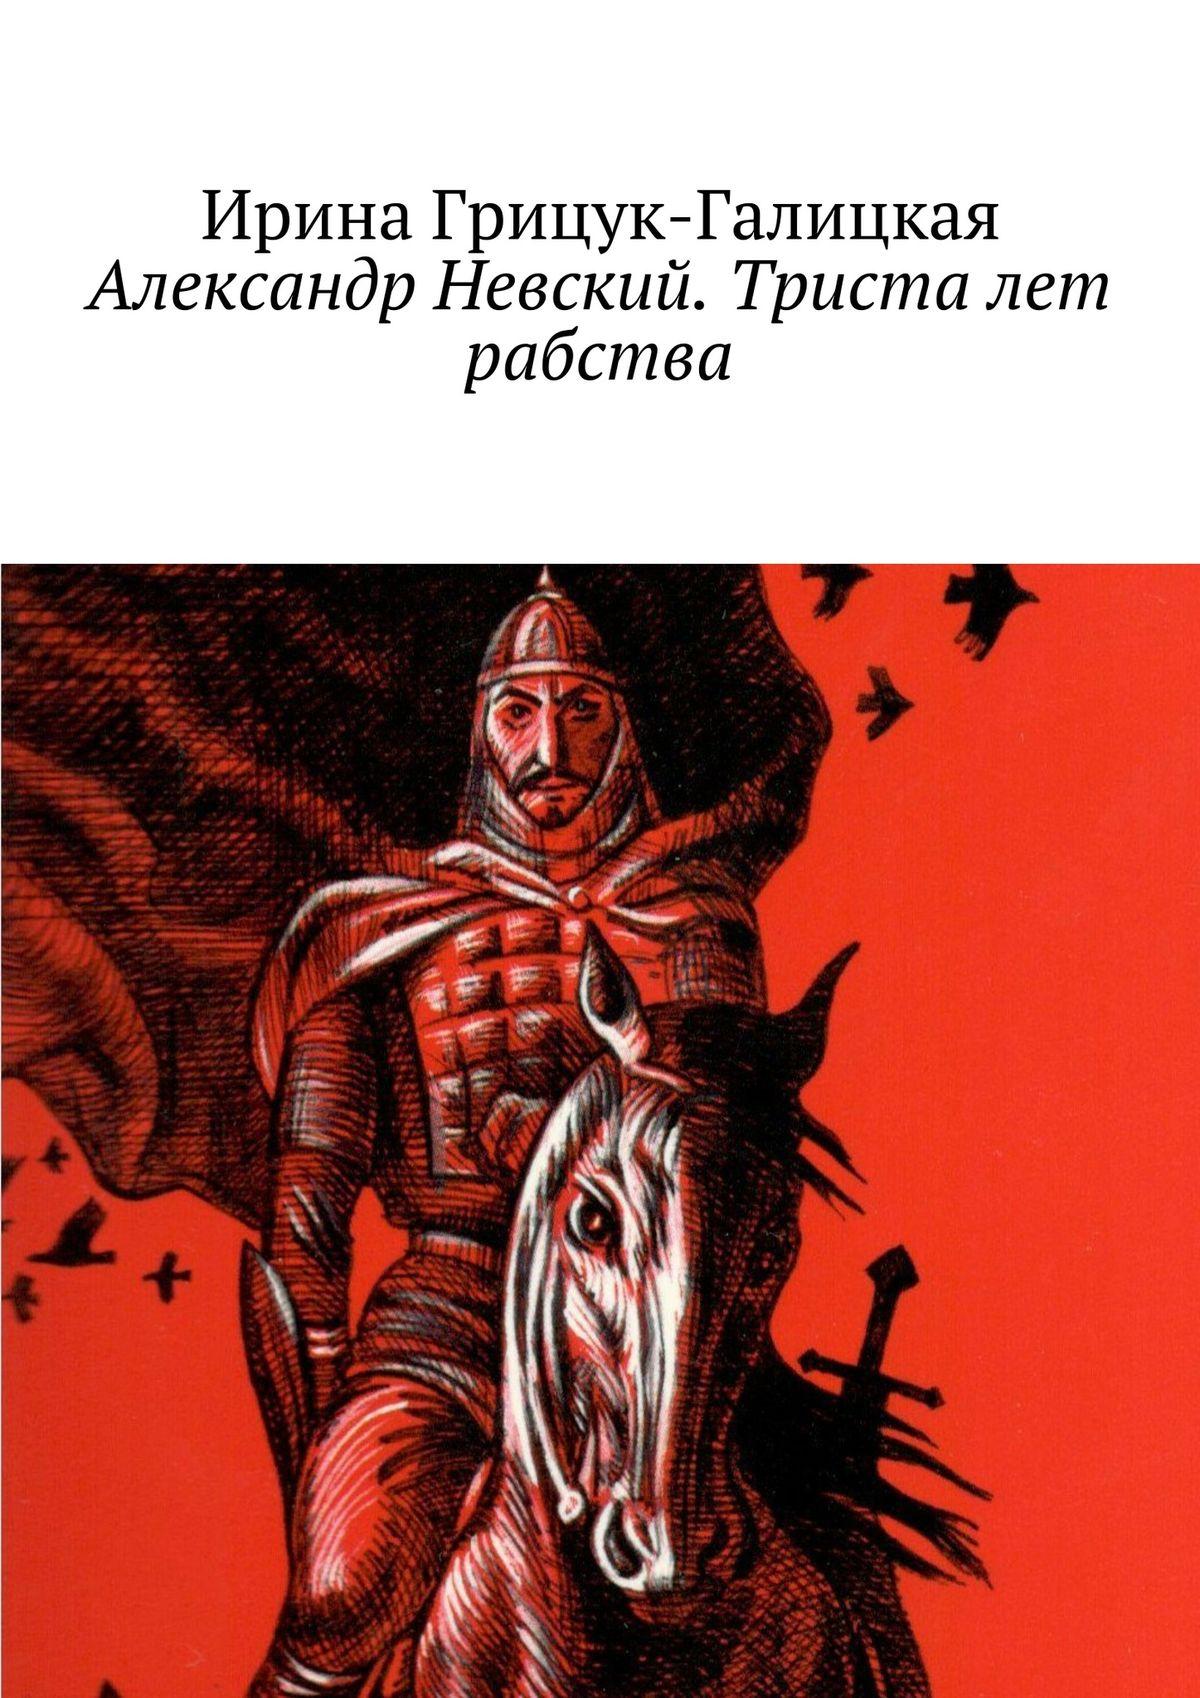 Александр Невский. Триста лет рабства